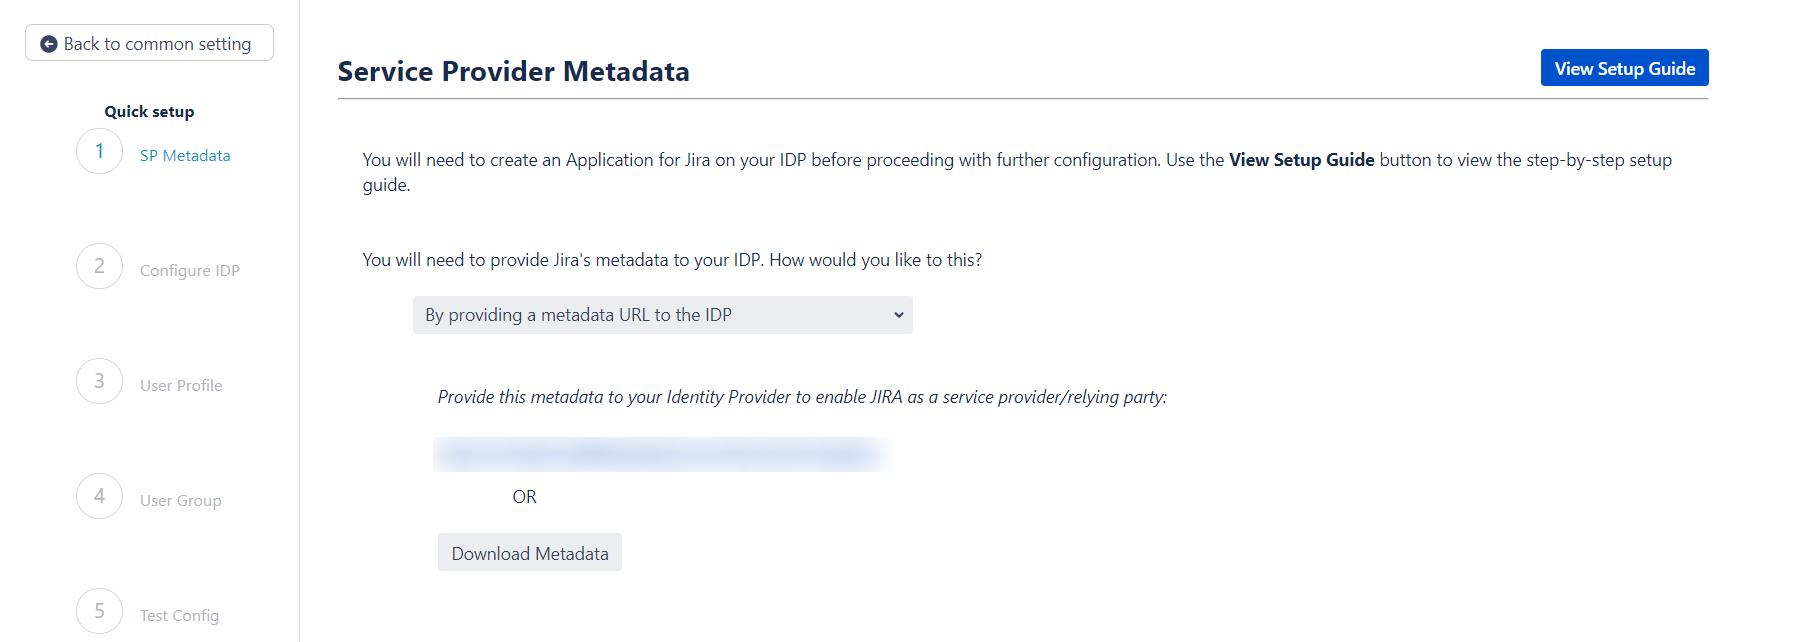 SAML Single Sign On (SSO) into Jira, Quick Setup sp metadata url